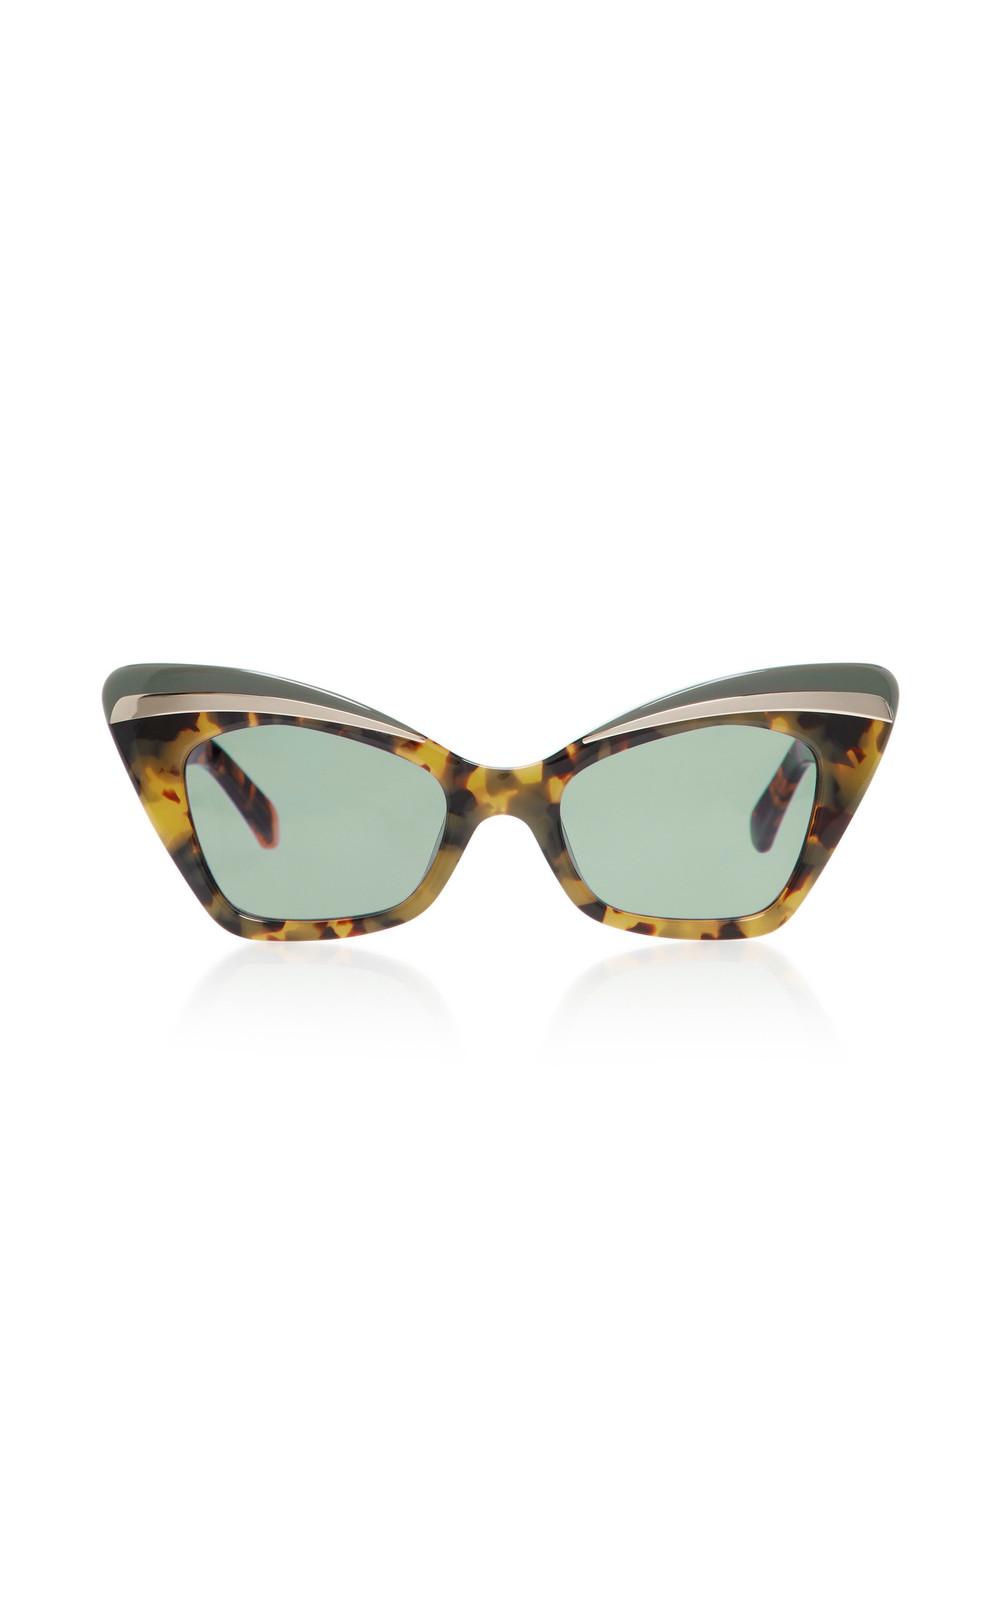 Karen Walker Babou Cat-Eye Tortoiseshell Acetate and Metal Sunglasses in brown